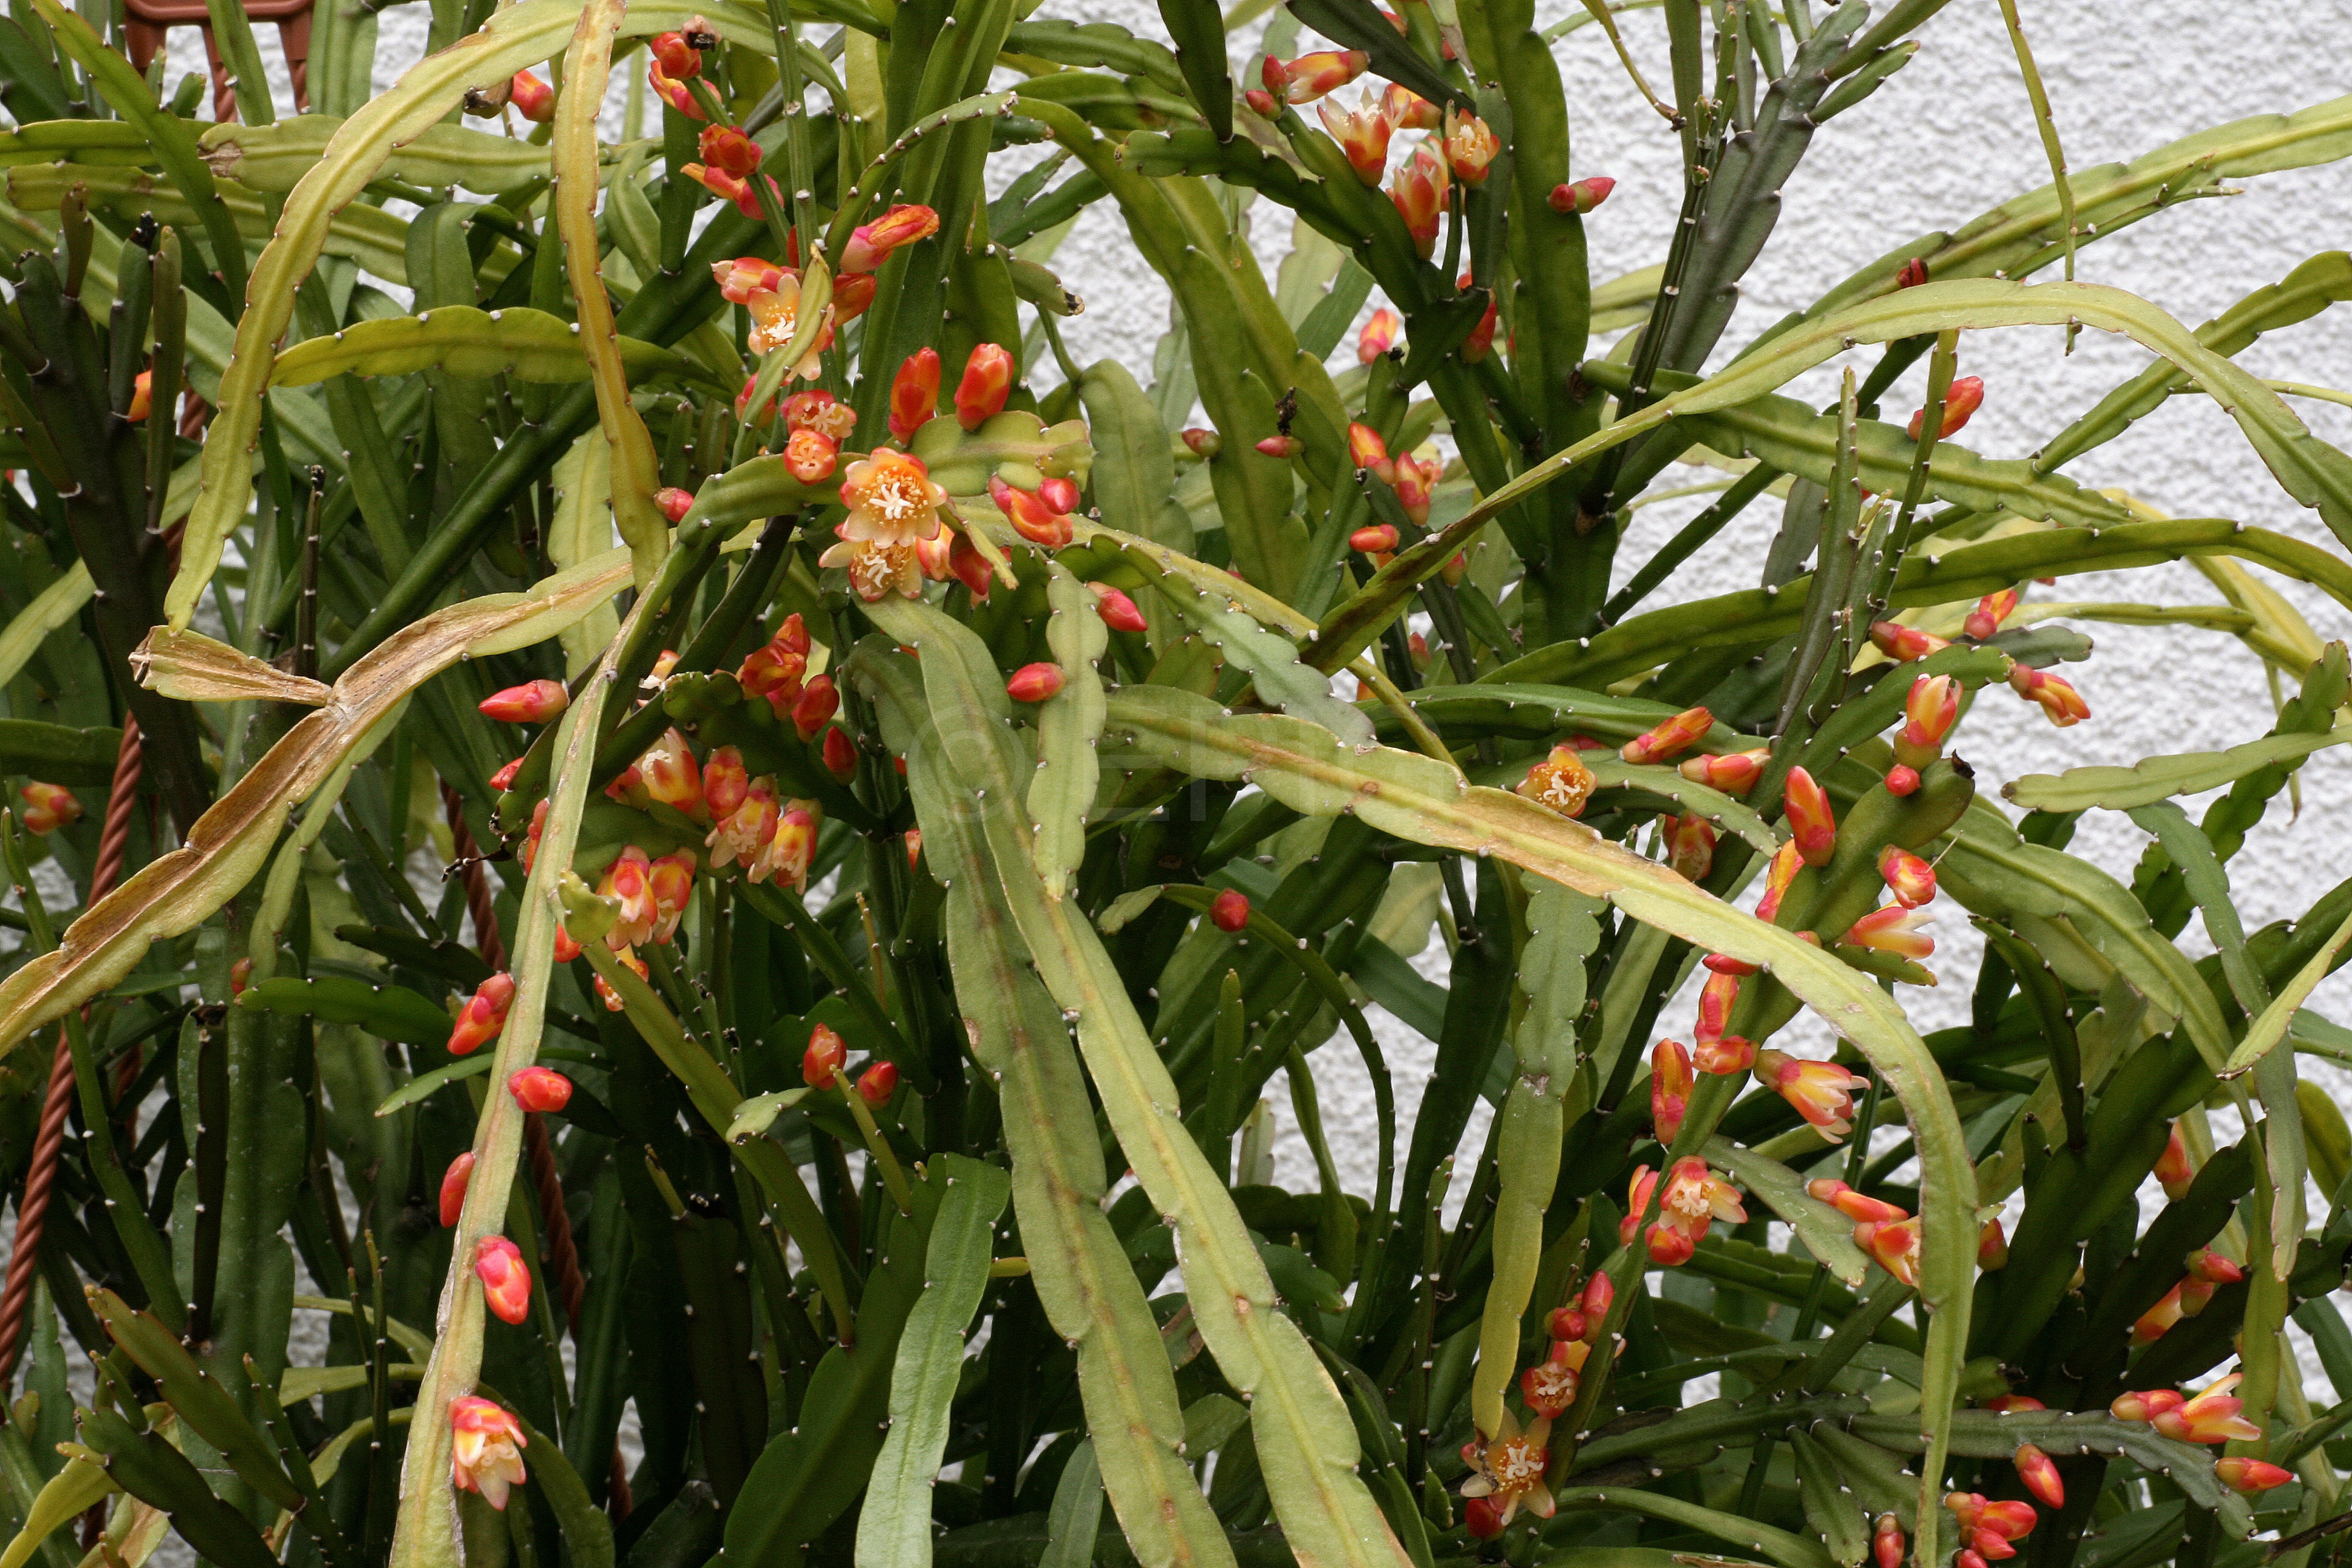 Pfeiffera boliviana HBG52994 (Foto Jochen Bockemühl)